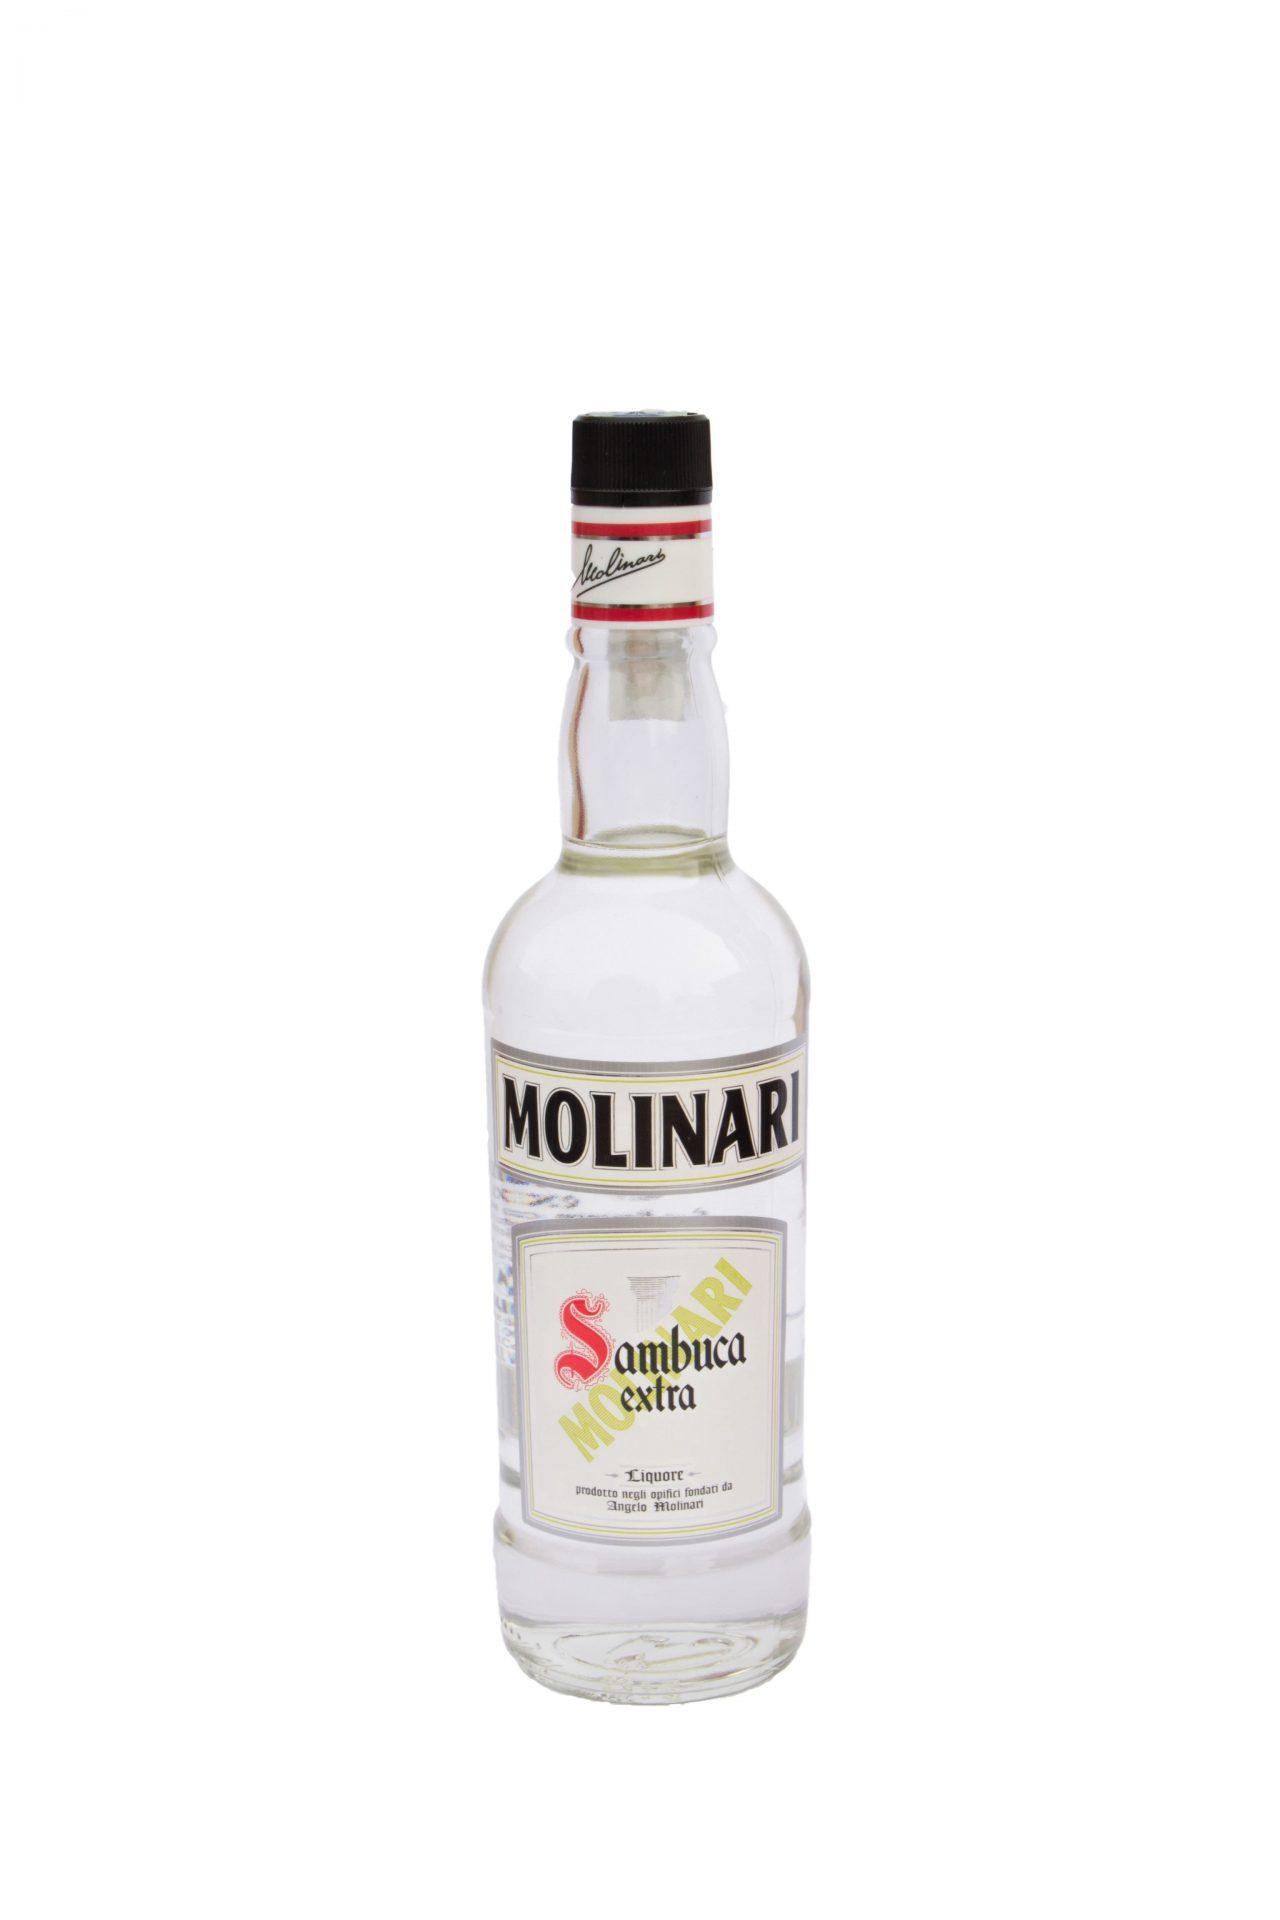 Molinari – Sambuca Extra